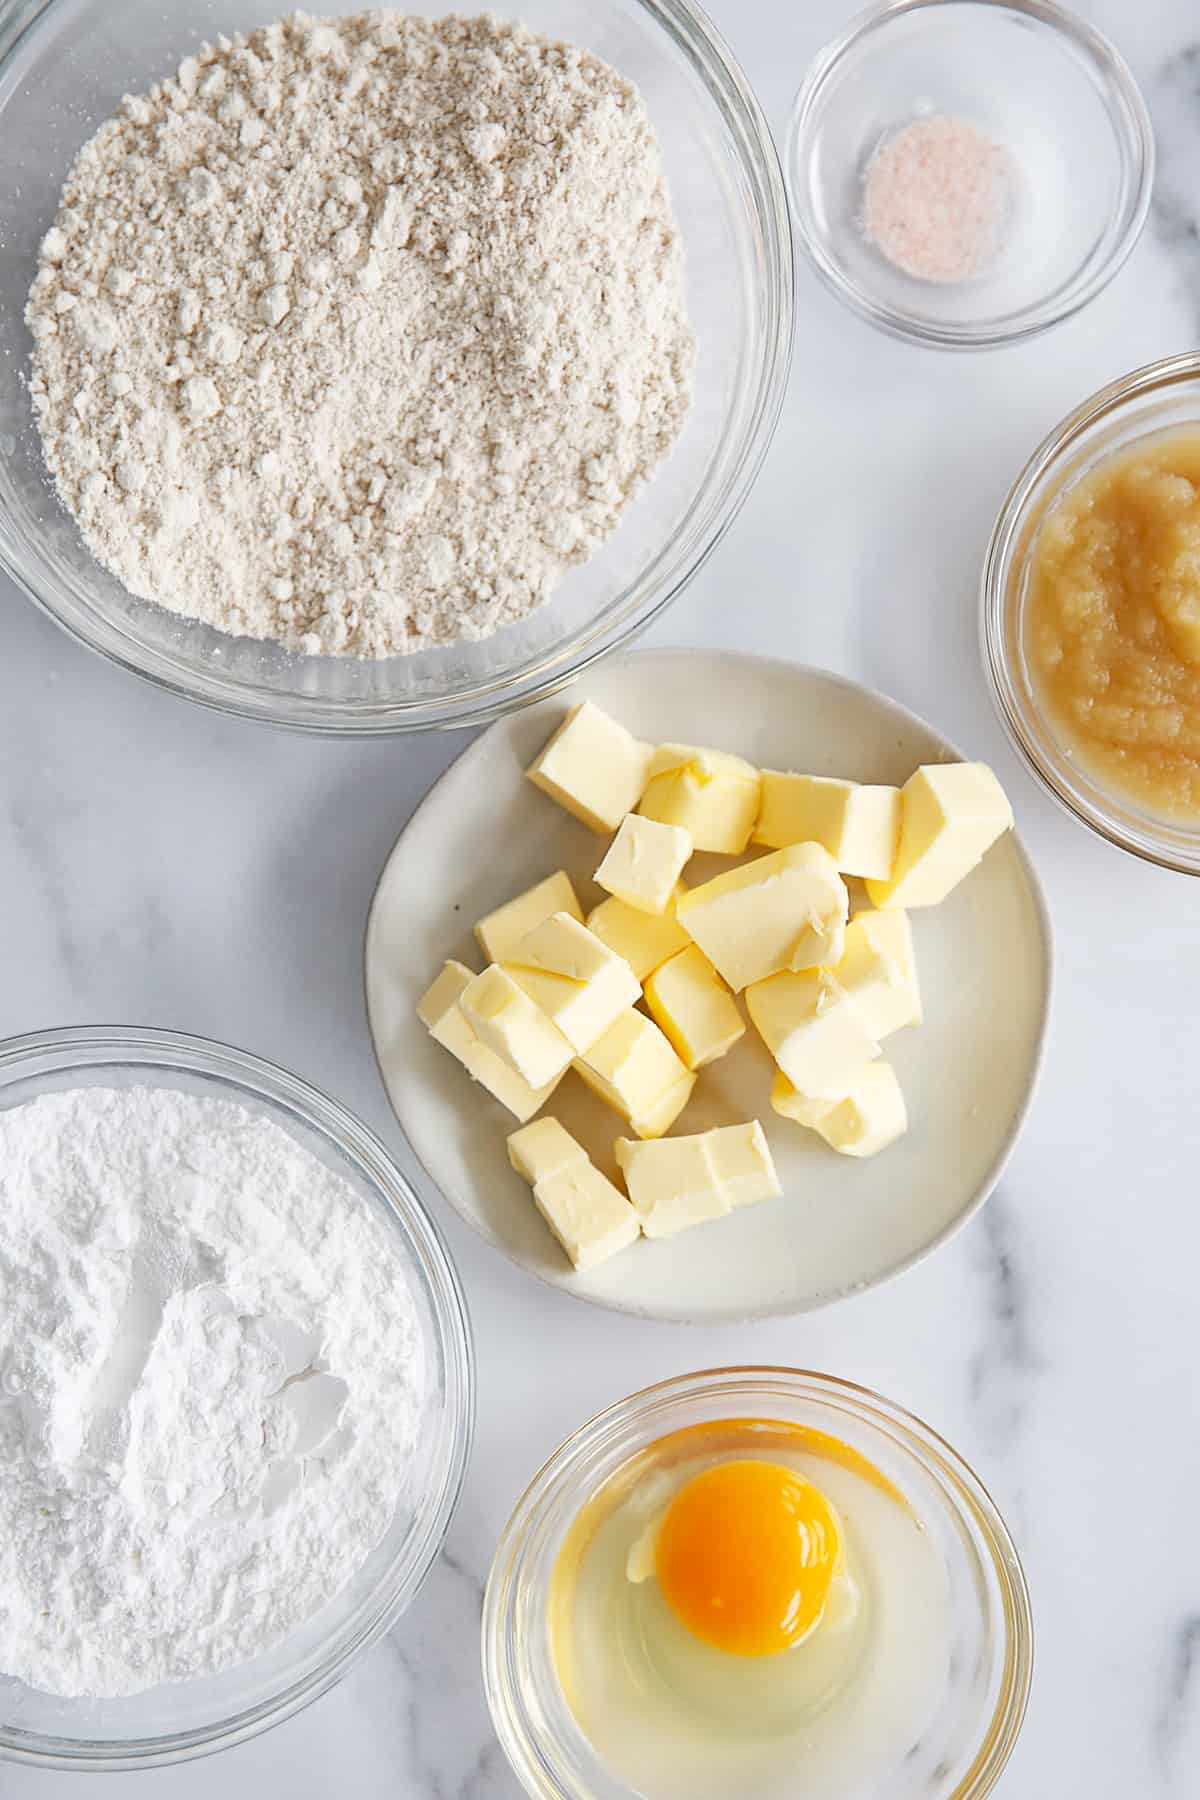 Ingredients for oat flour pie crust